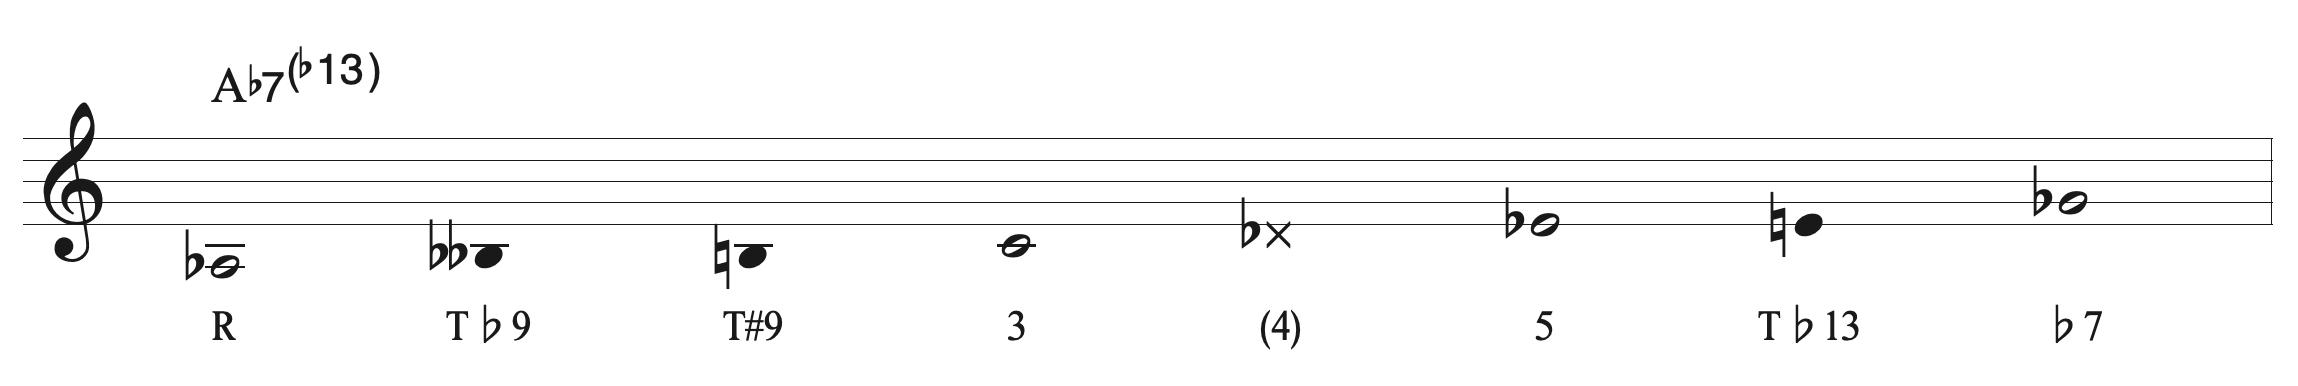 A♭ Mixo ♭9, #9, ♭13